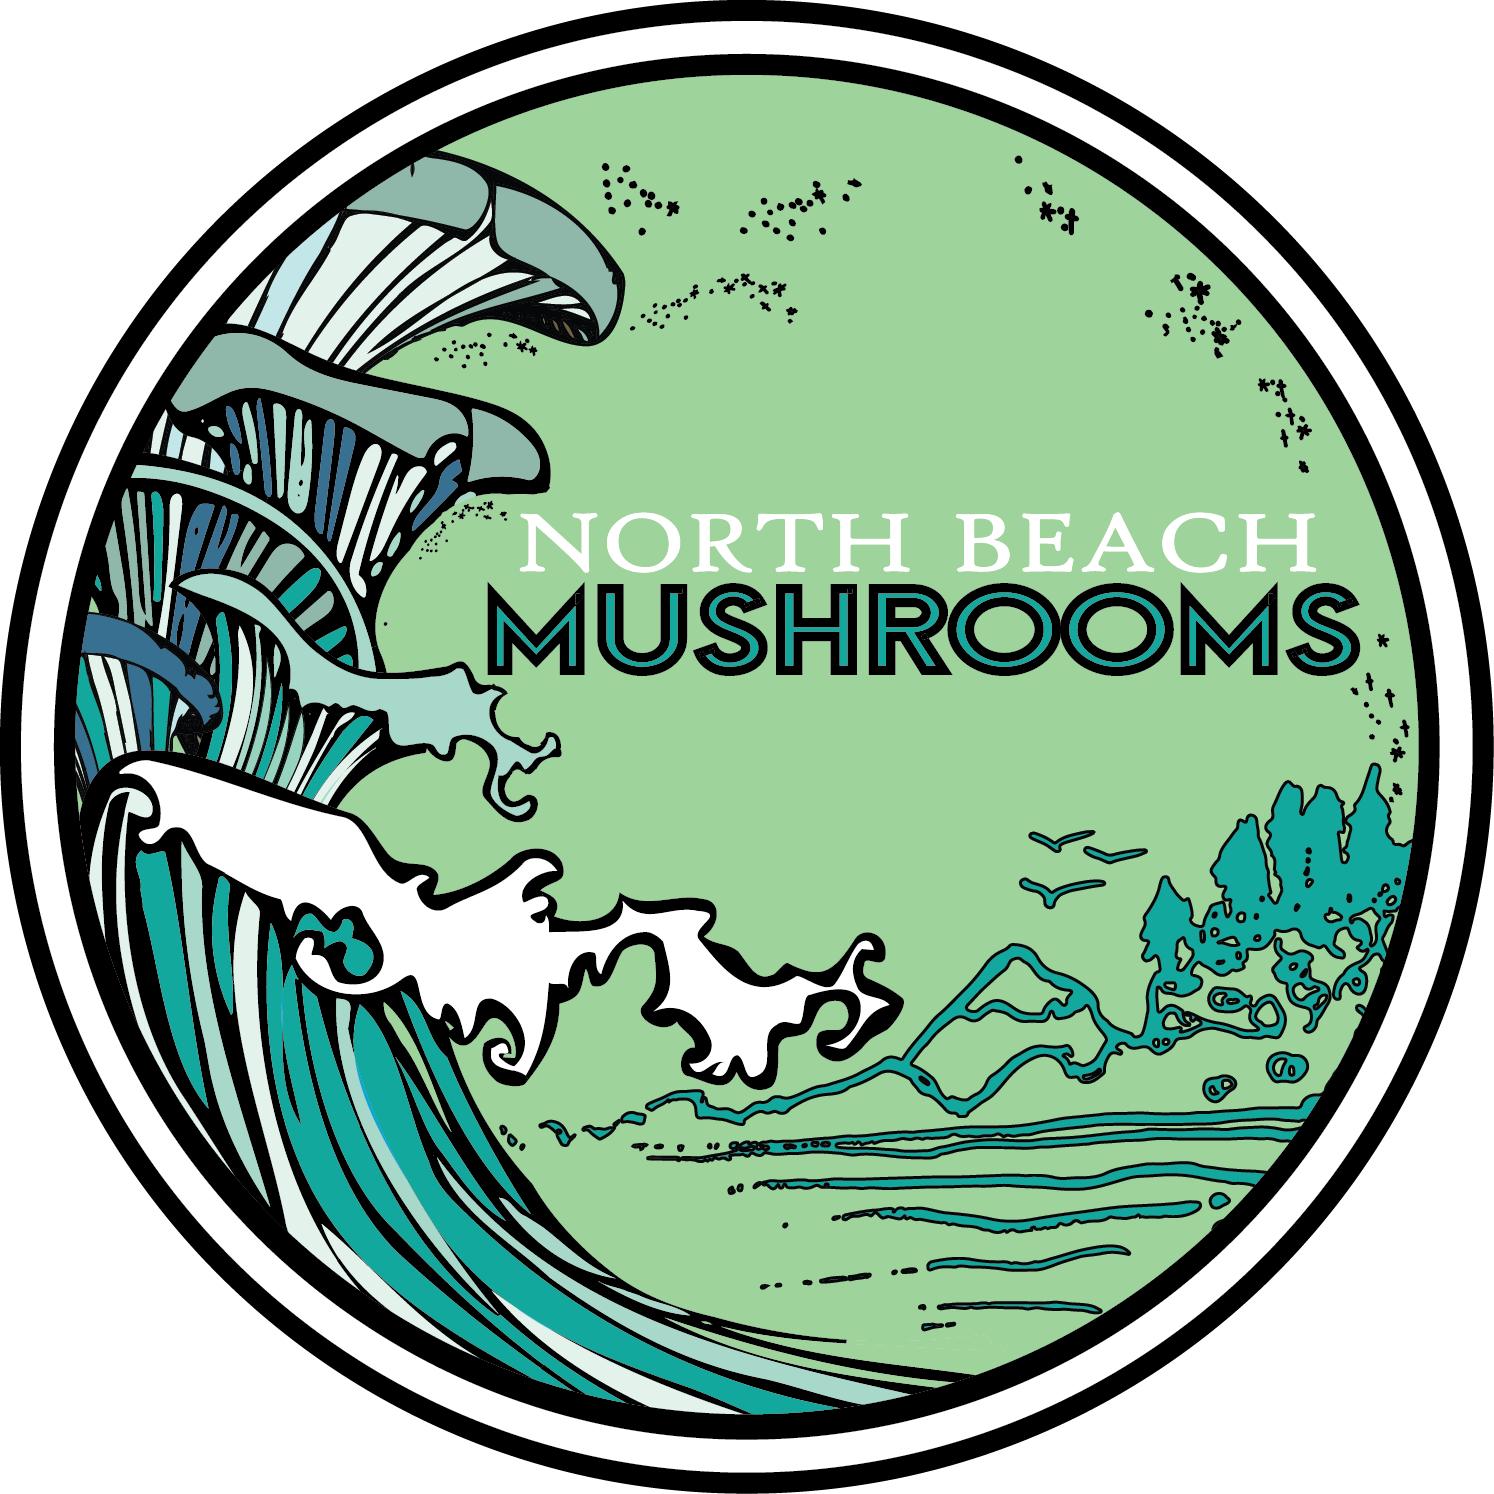 North Beach Mushrooms